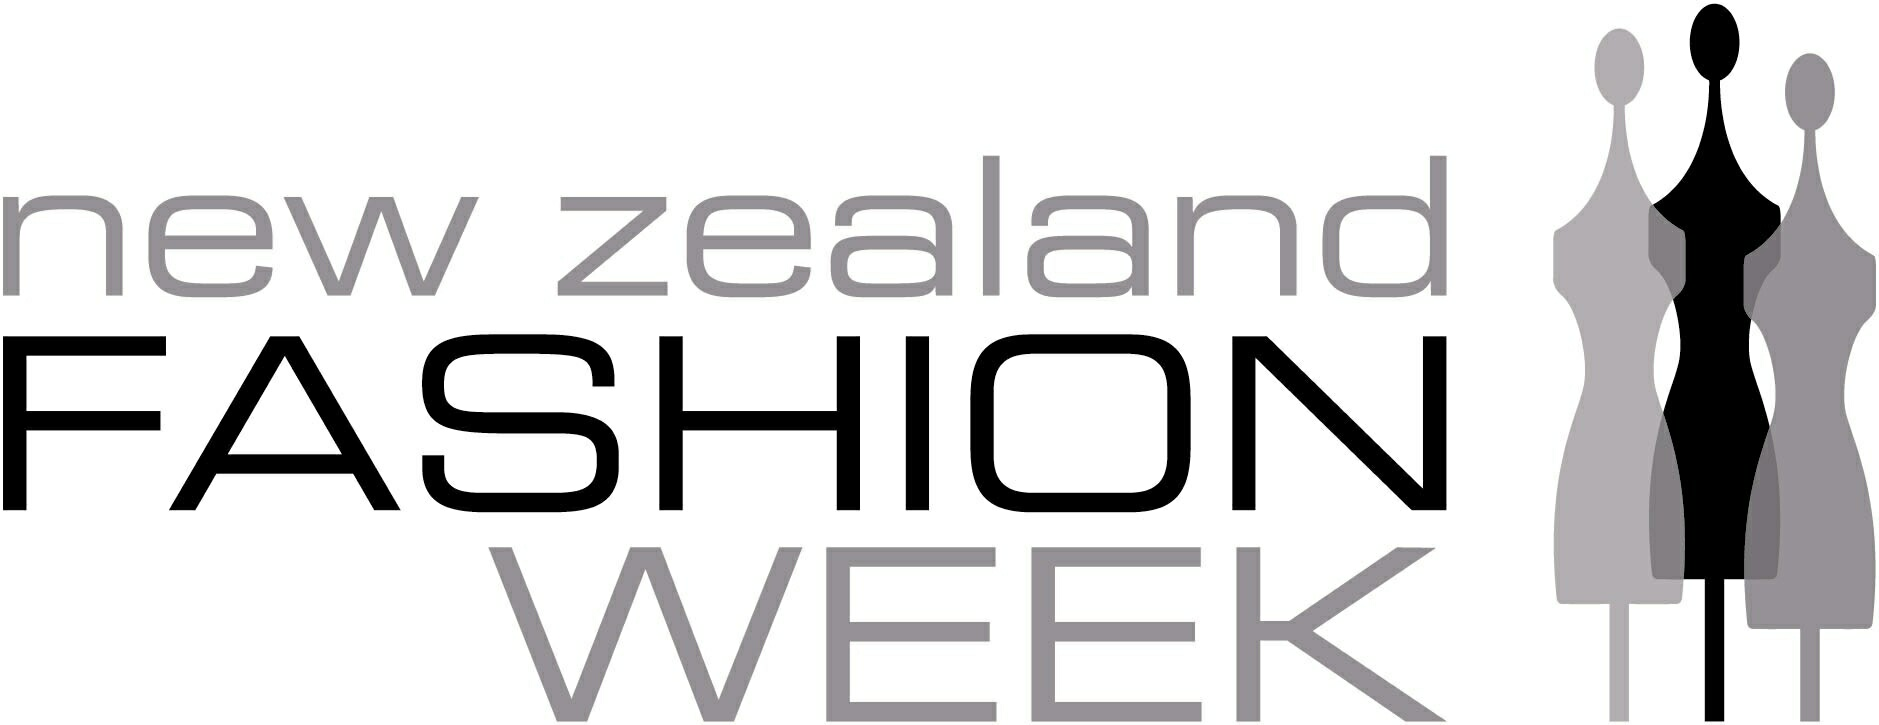 nzfw logo.jpg